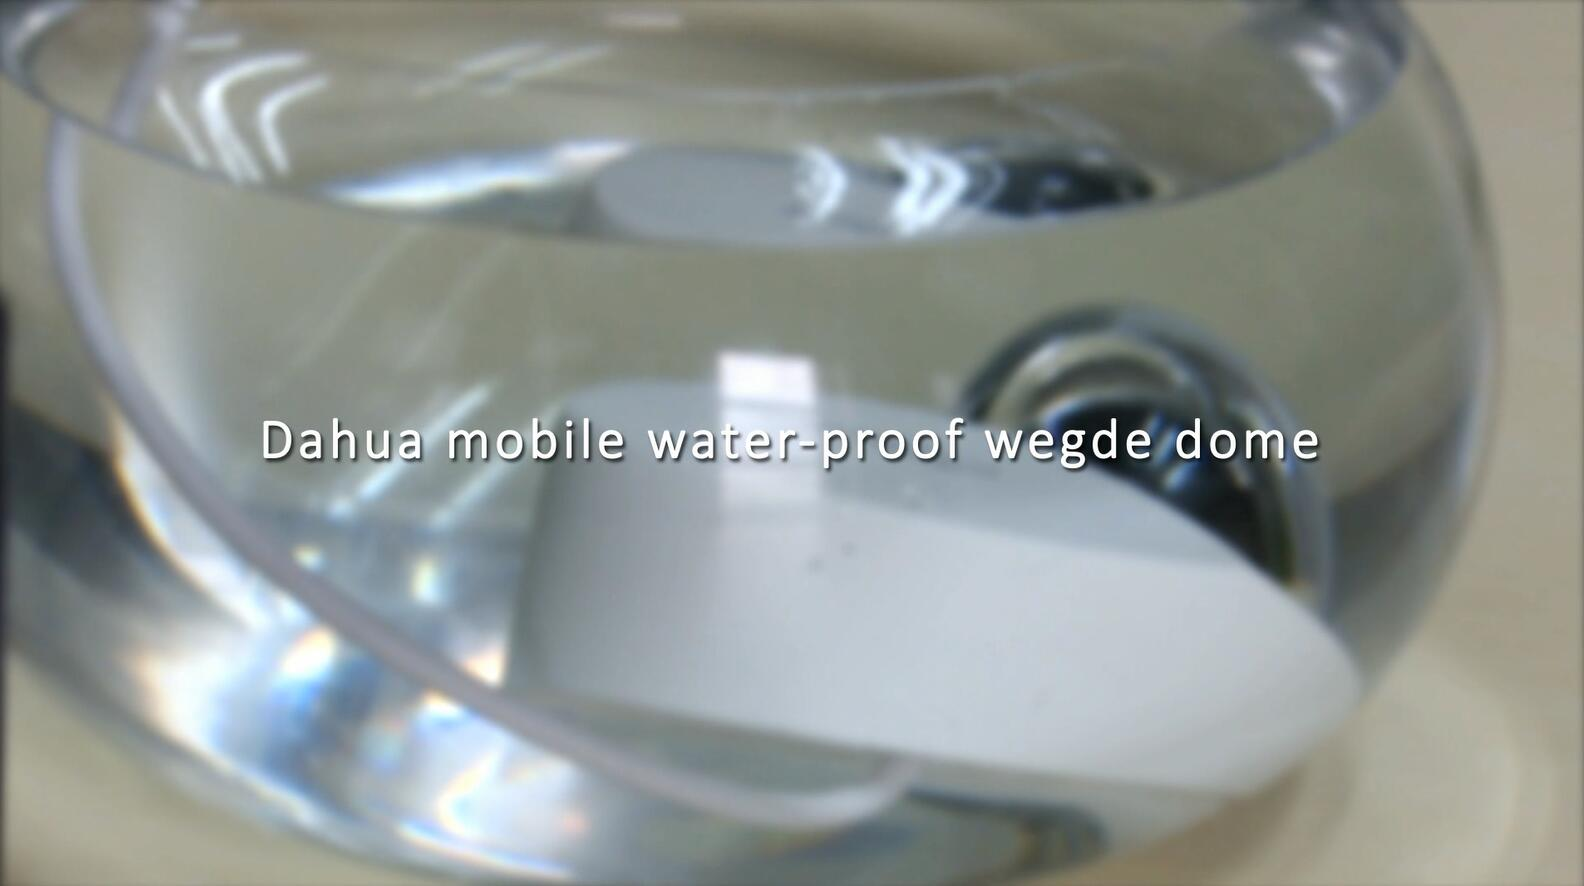 Dahua mobile water-proof wegde dome